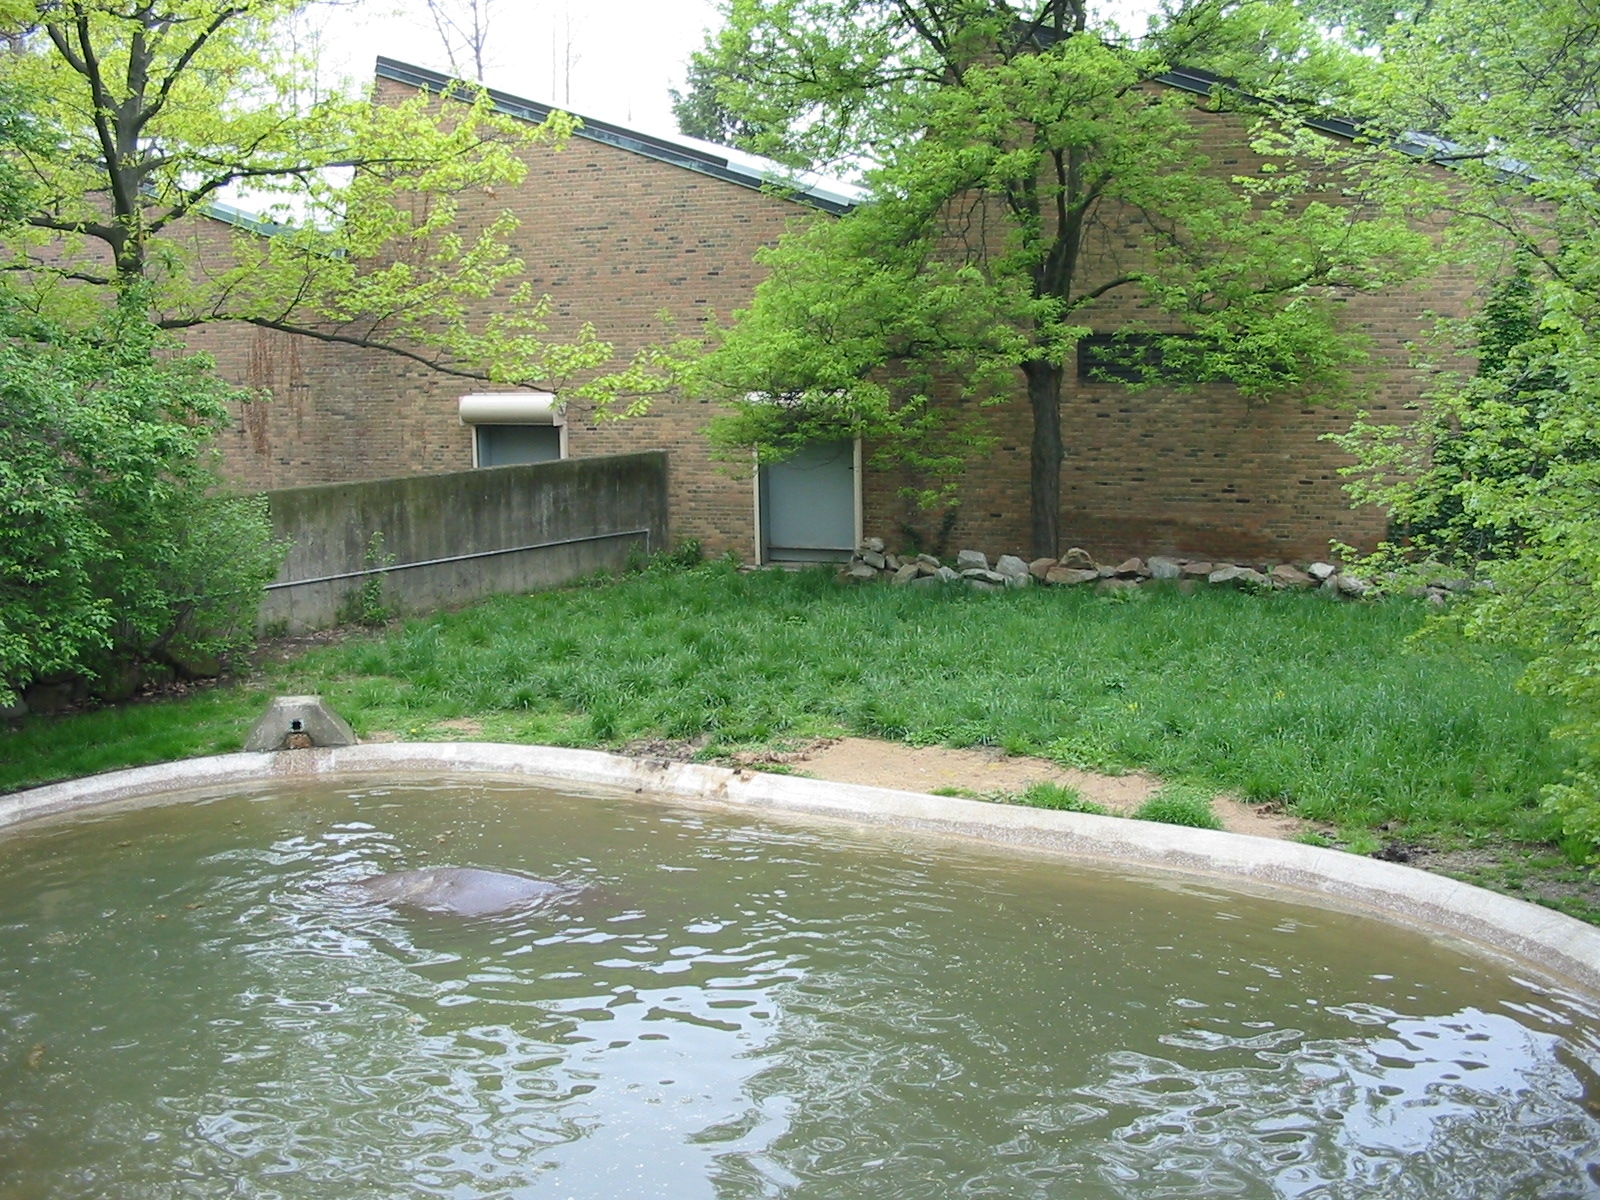 Cleveland Zoo 2003 - Hippopotamus Exhibit Pachyderm House Zoochat